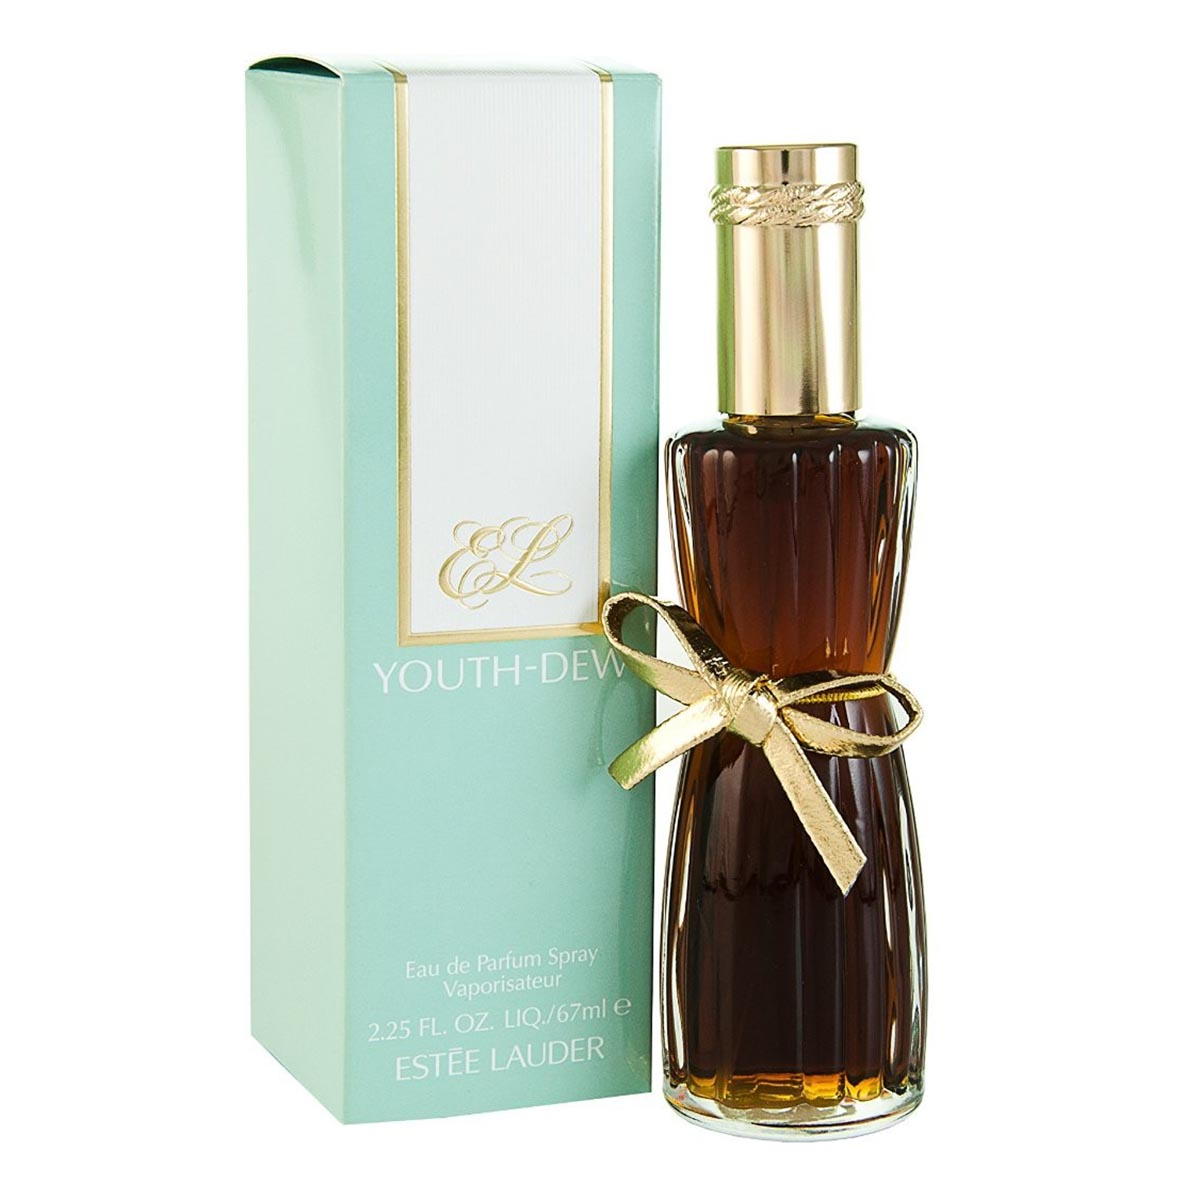 Estee lauder youth dew eau de parfum 65ml vaporizador